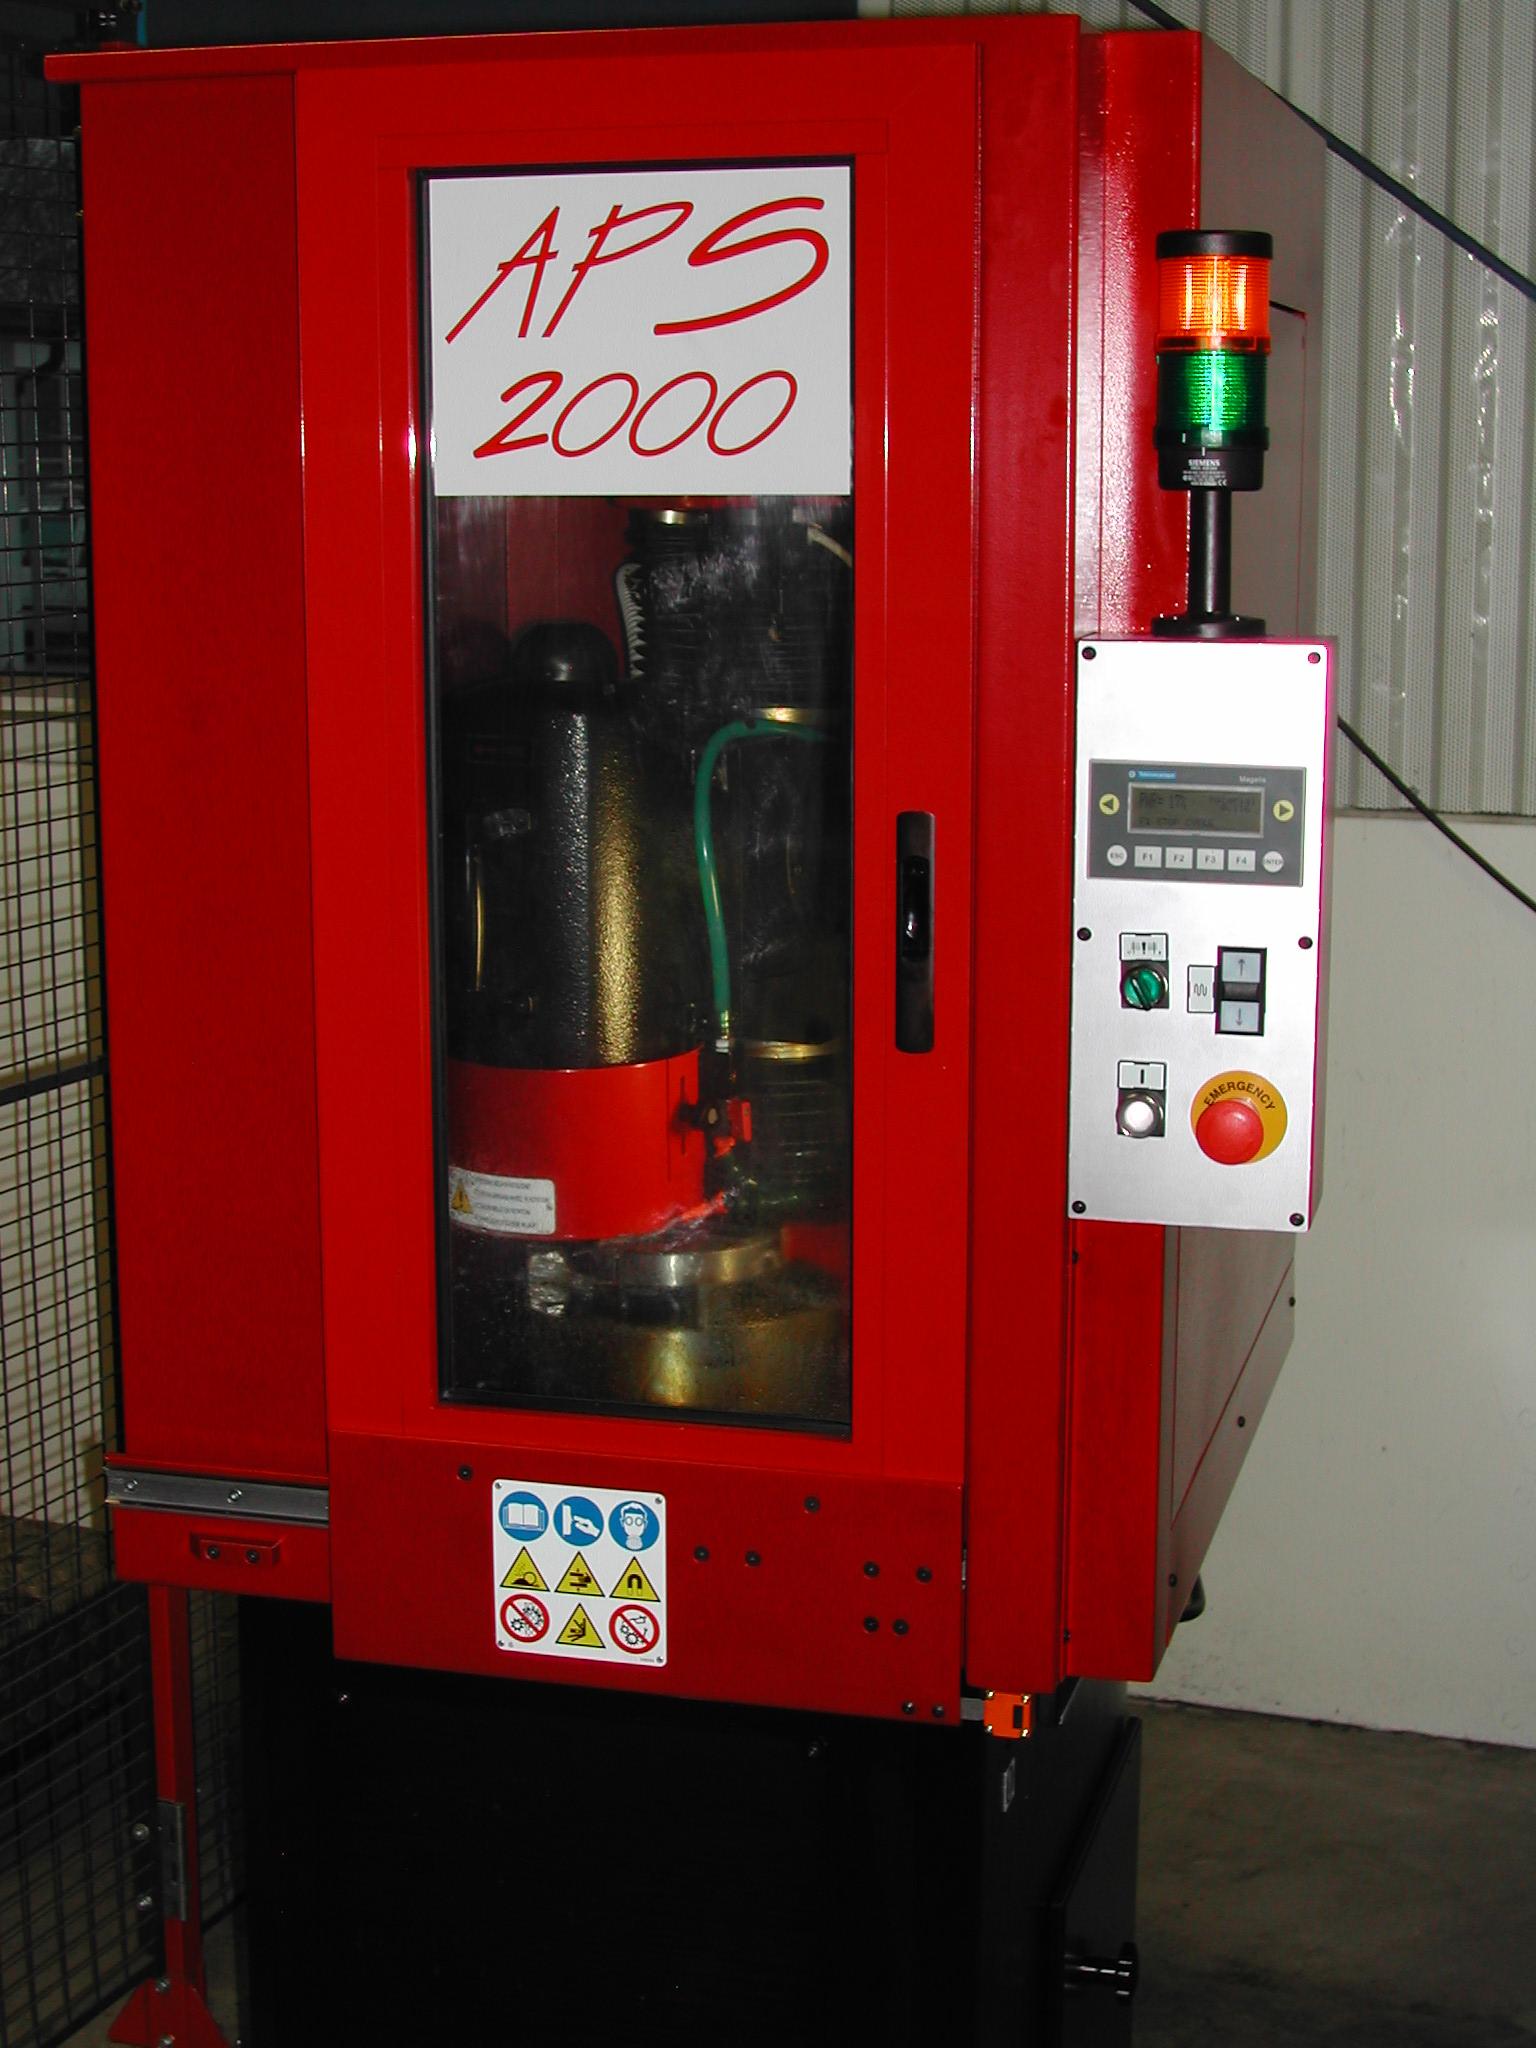 20060426 APS-2000 008